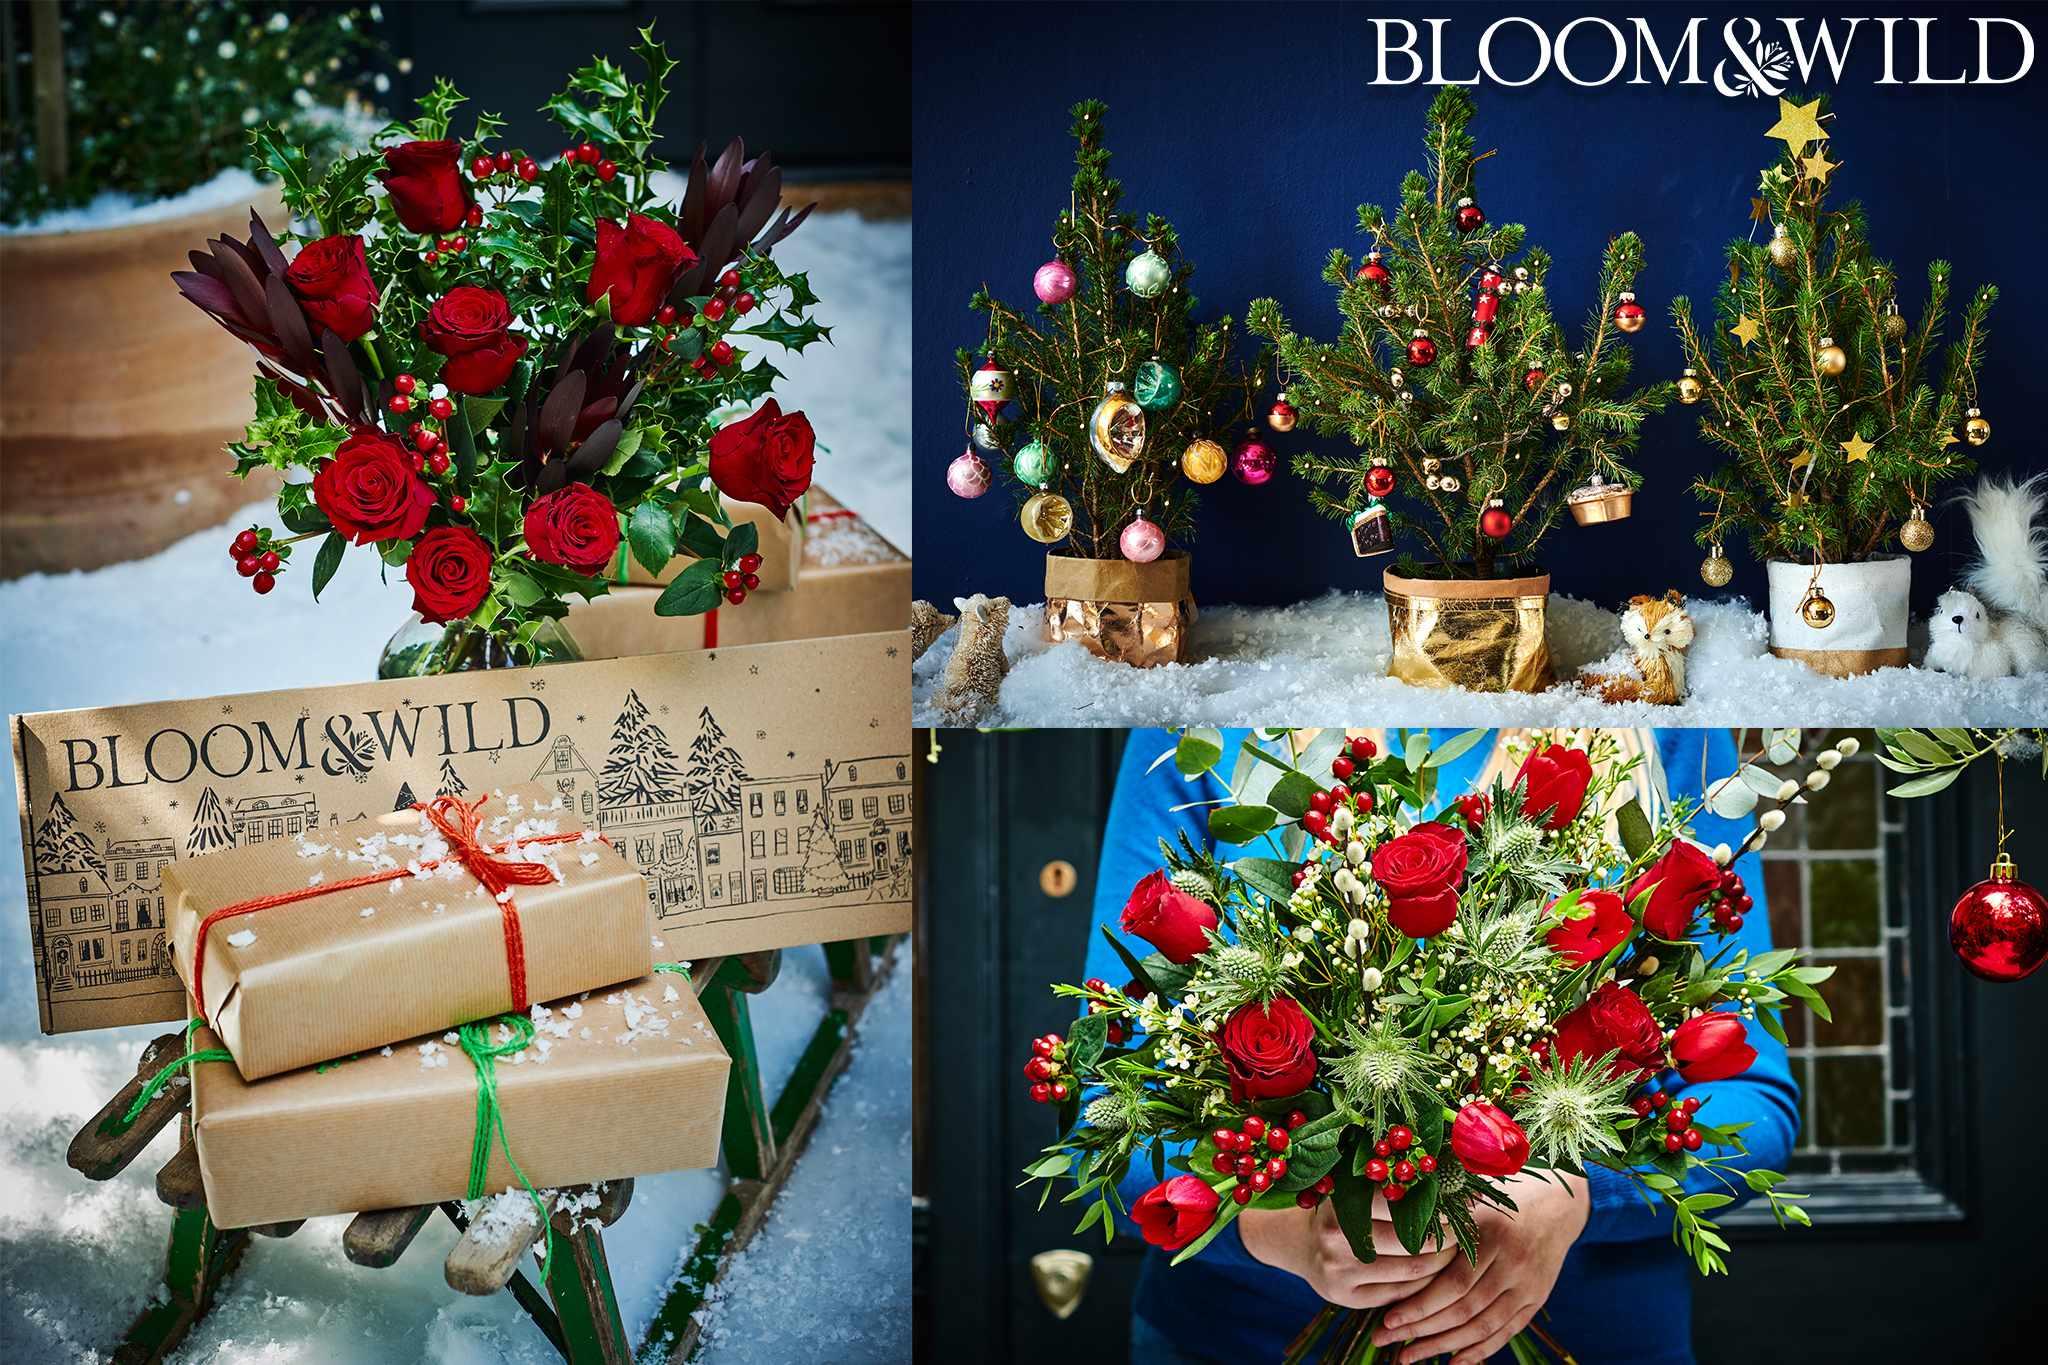 2018-nov-bloomandwild_1-2048-1365